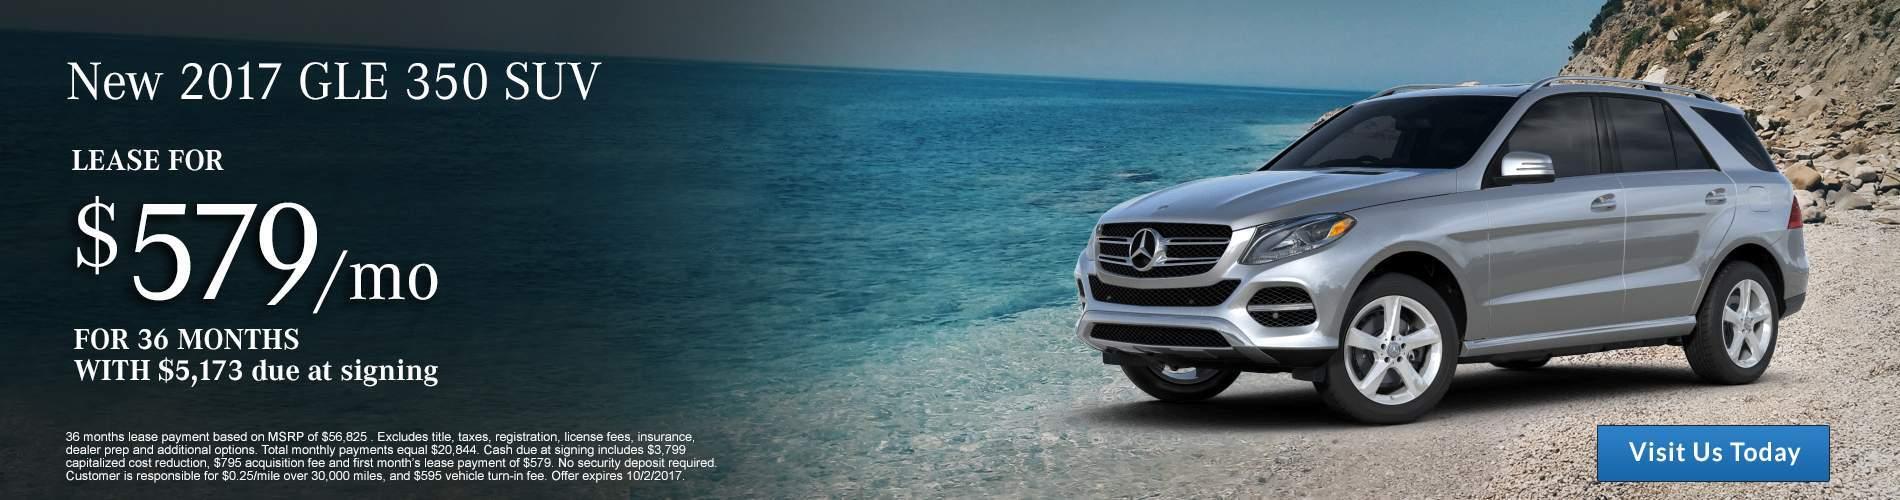 Mercedes benz dealership fayetteville nc used cars for Mercedes benz of fayetteville